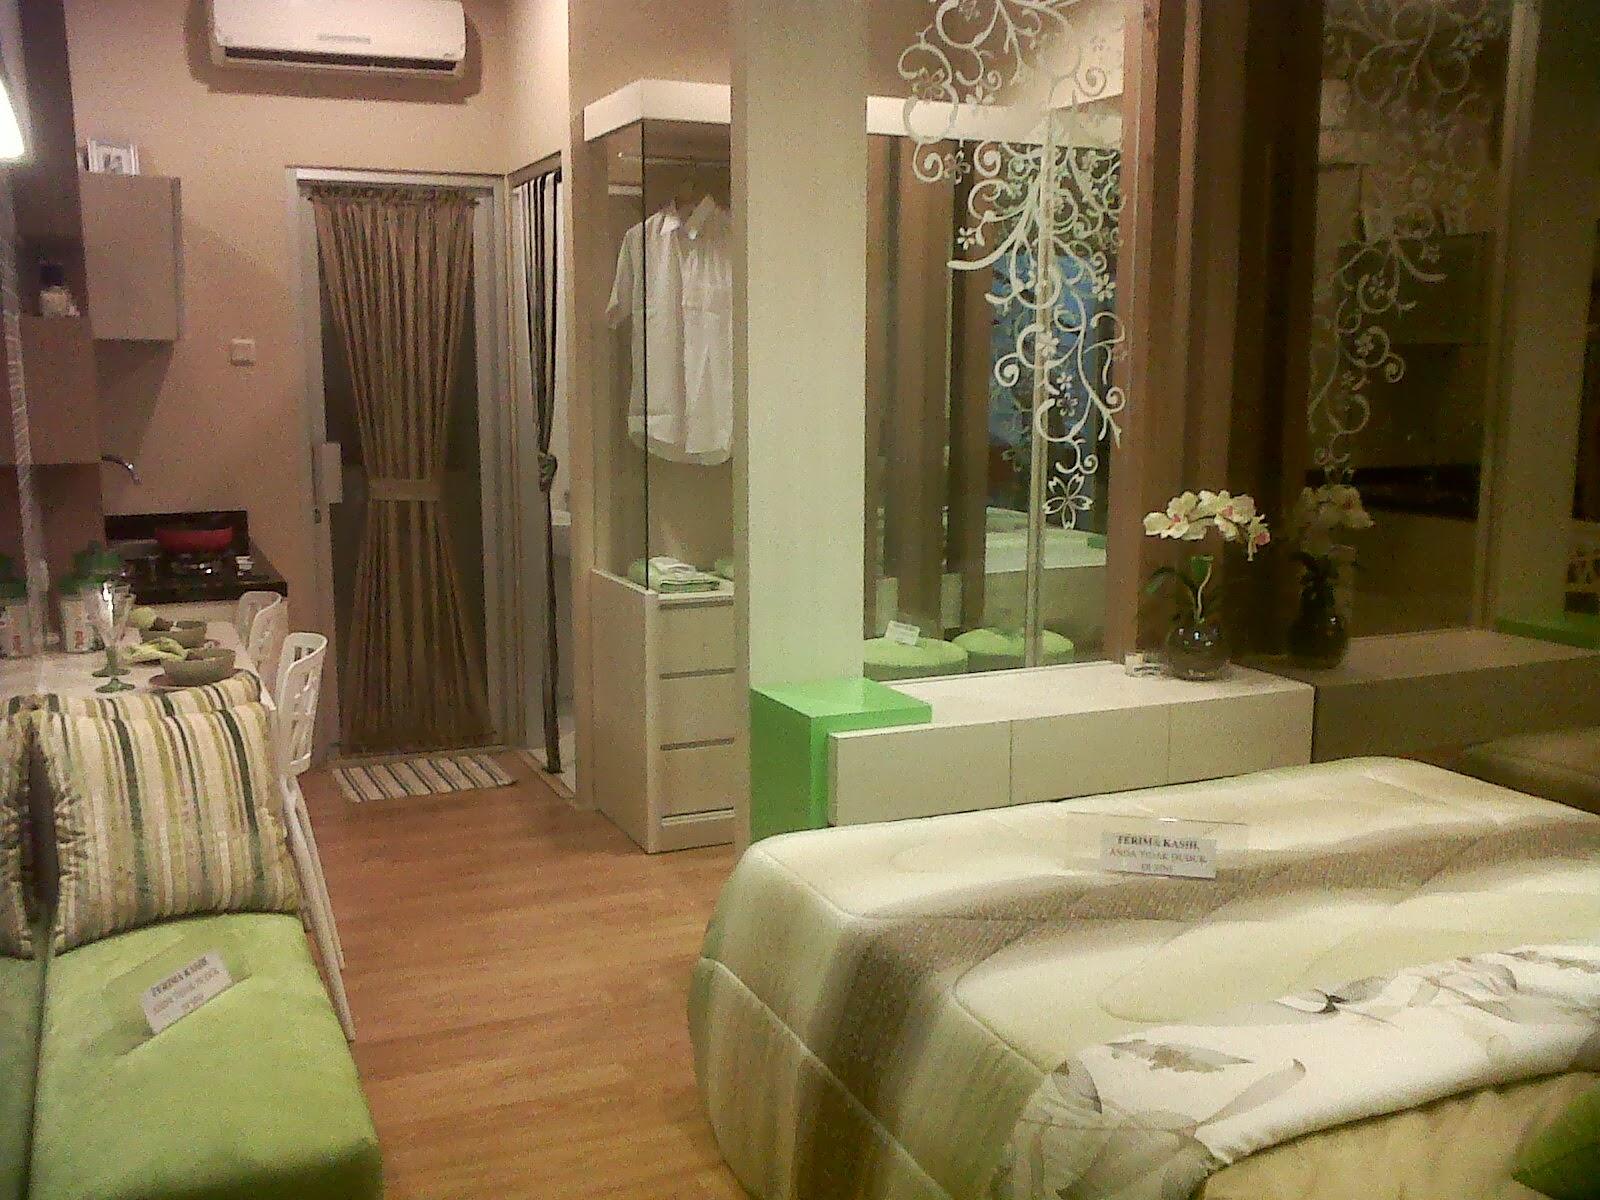 10 Hotel Bintang 5 di Bandung yang Terbaik